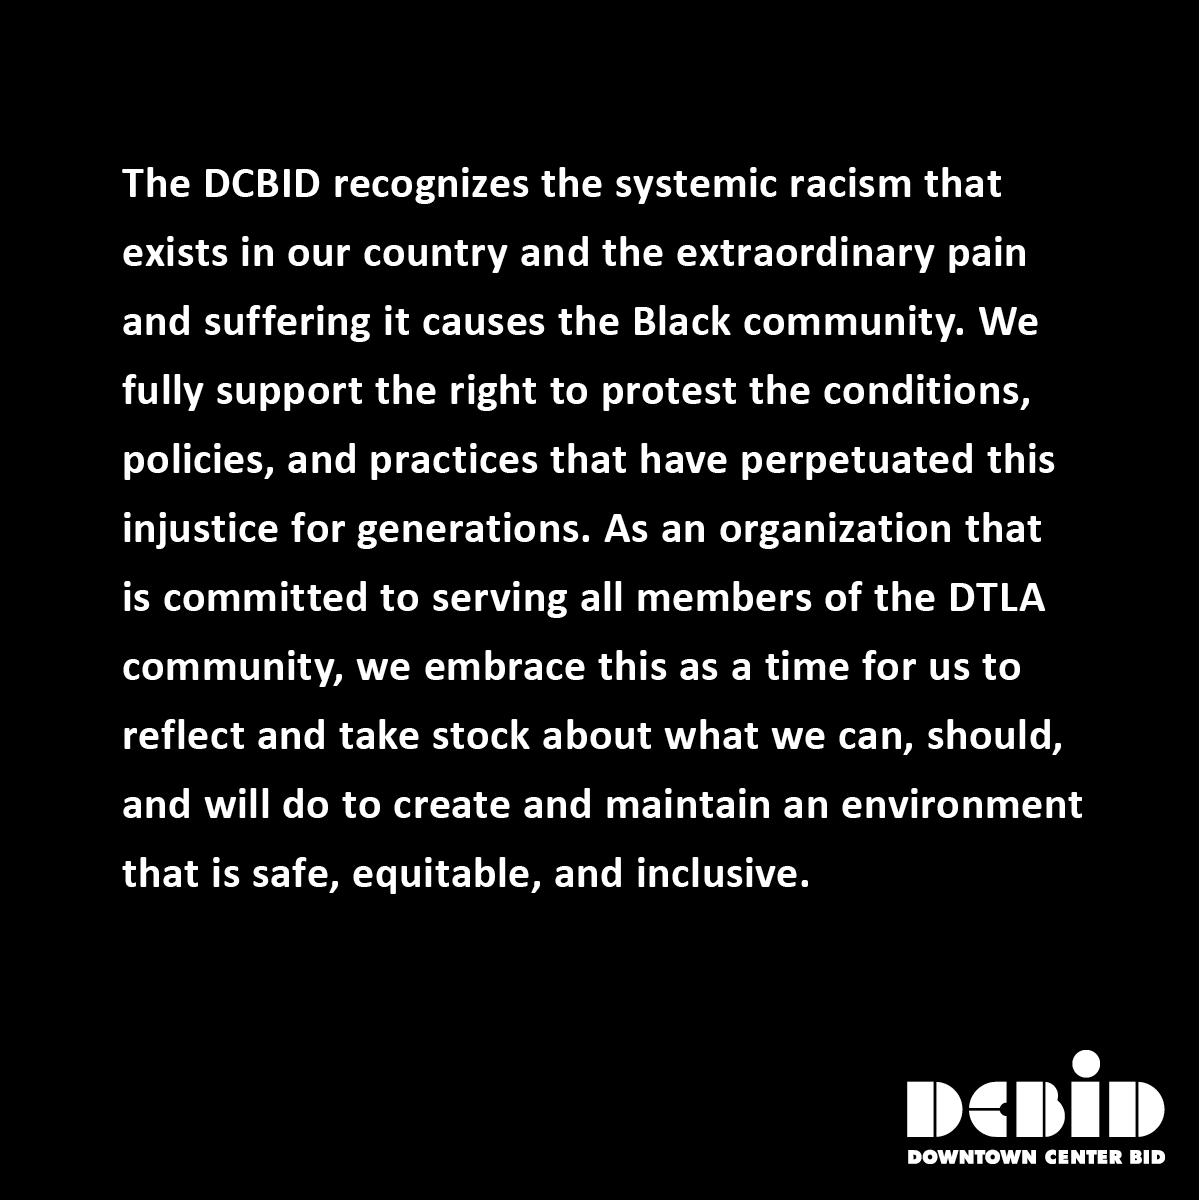 DCBID Statement